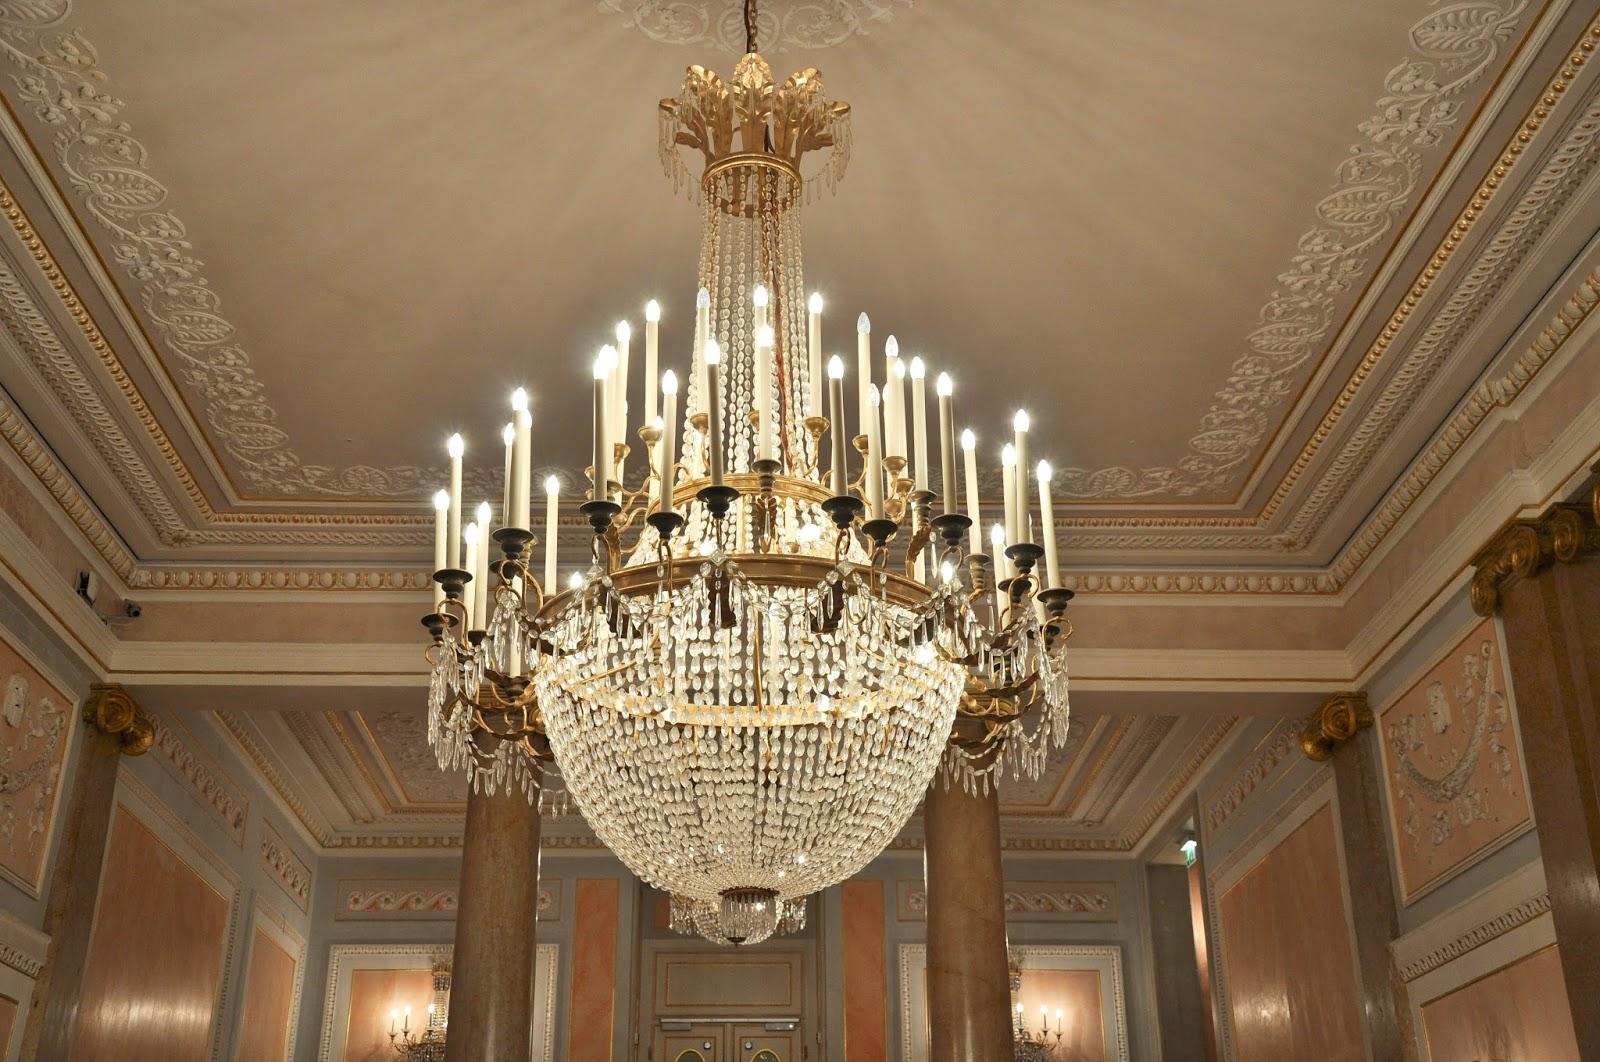 A crystal chandelier, La Fenice, Venice, Italy